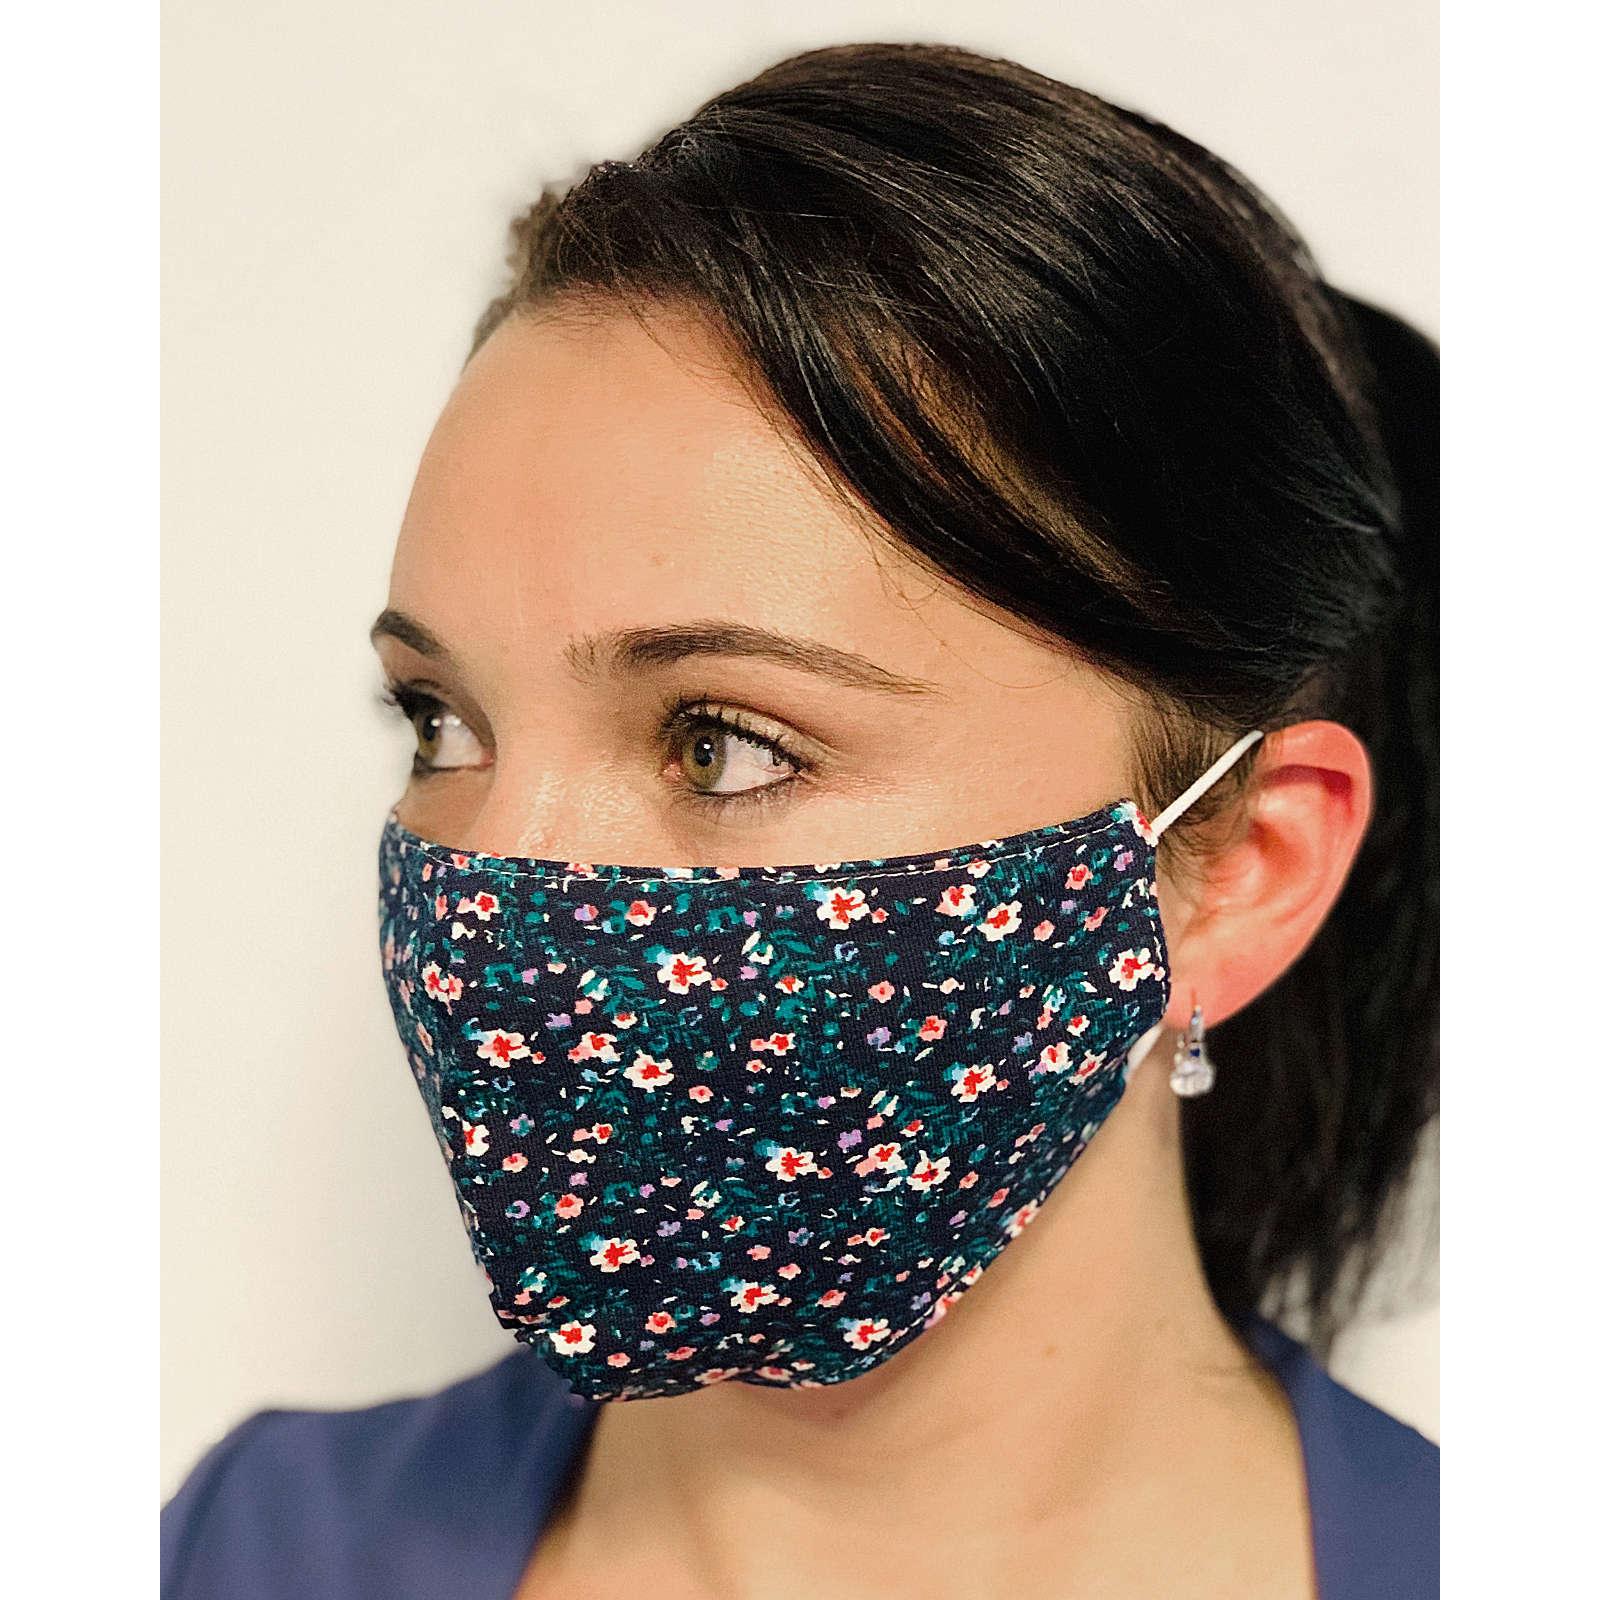 Albani Mund-Nasen-Maske, mehrfarbig mehrfarbig